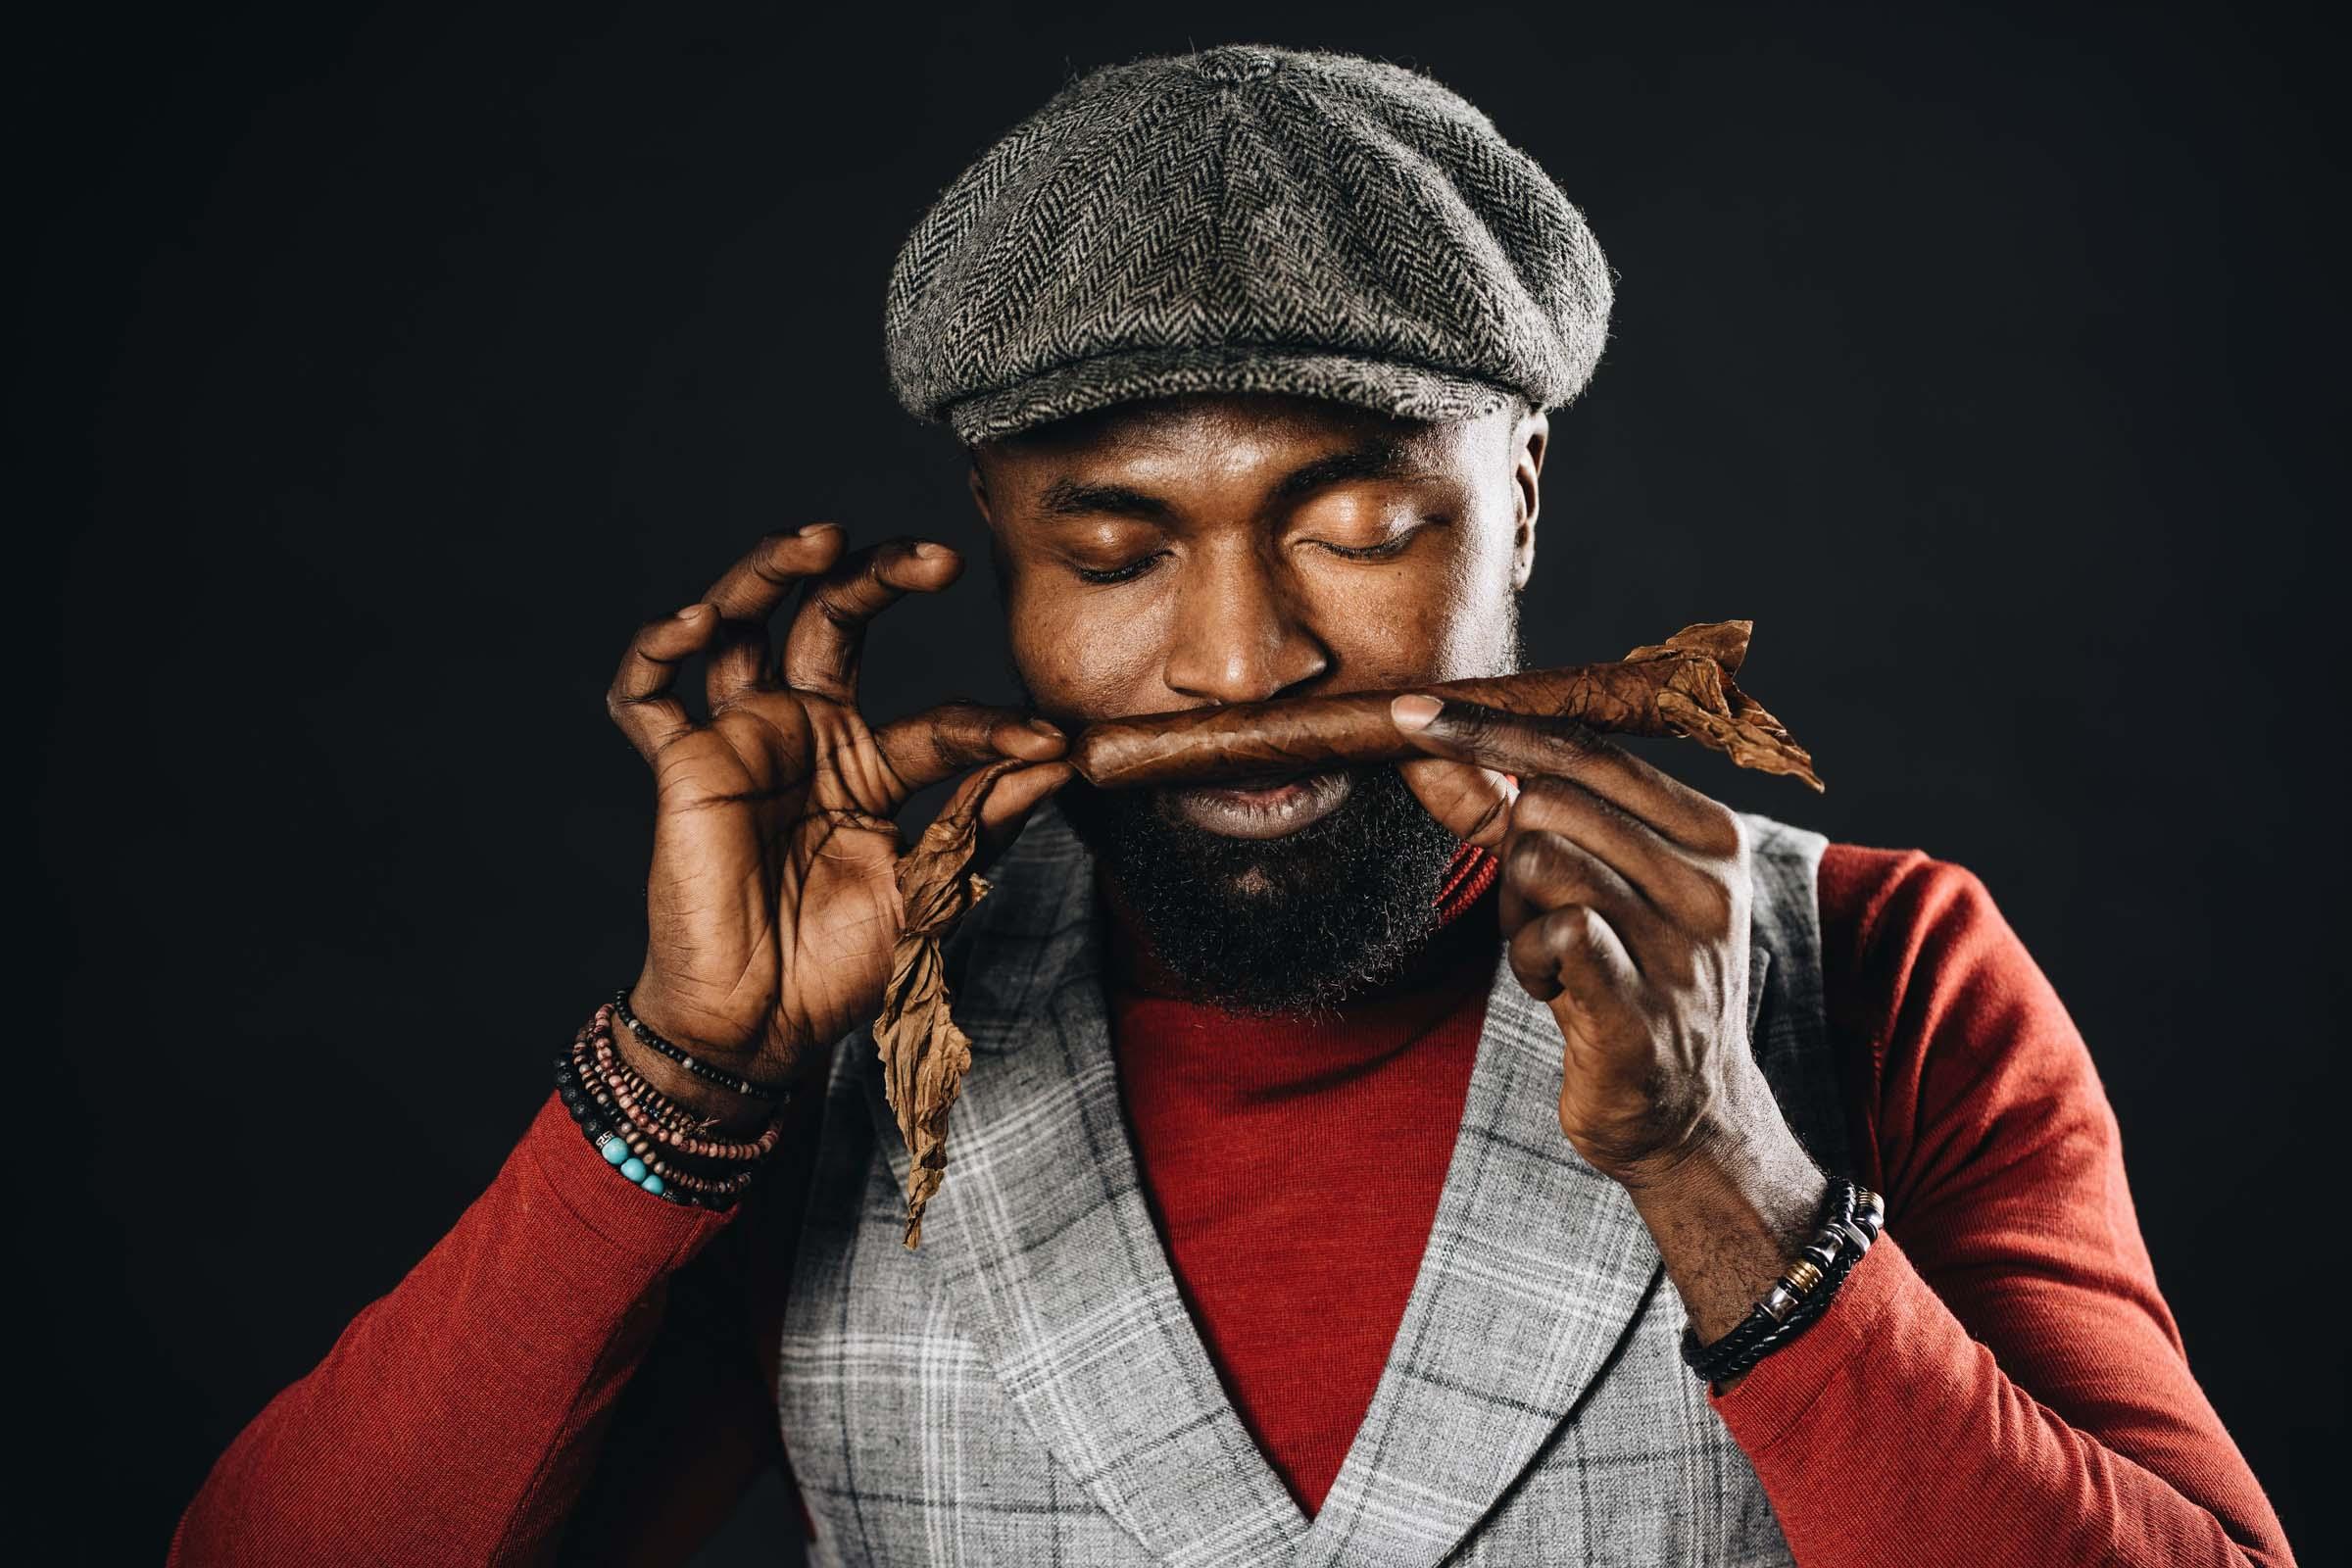 Zigarrendreher | Zigarrenroller | Zigarrenrollerin | Mieten | Anfragen | Trocadero | Handgemacht | Zigarren | Robusto | Corona | Torpedo | Churchill | Banderole | Bauchbinde | drehen | Tabak | Sumatra | Brasilien | Cuba